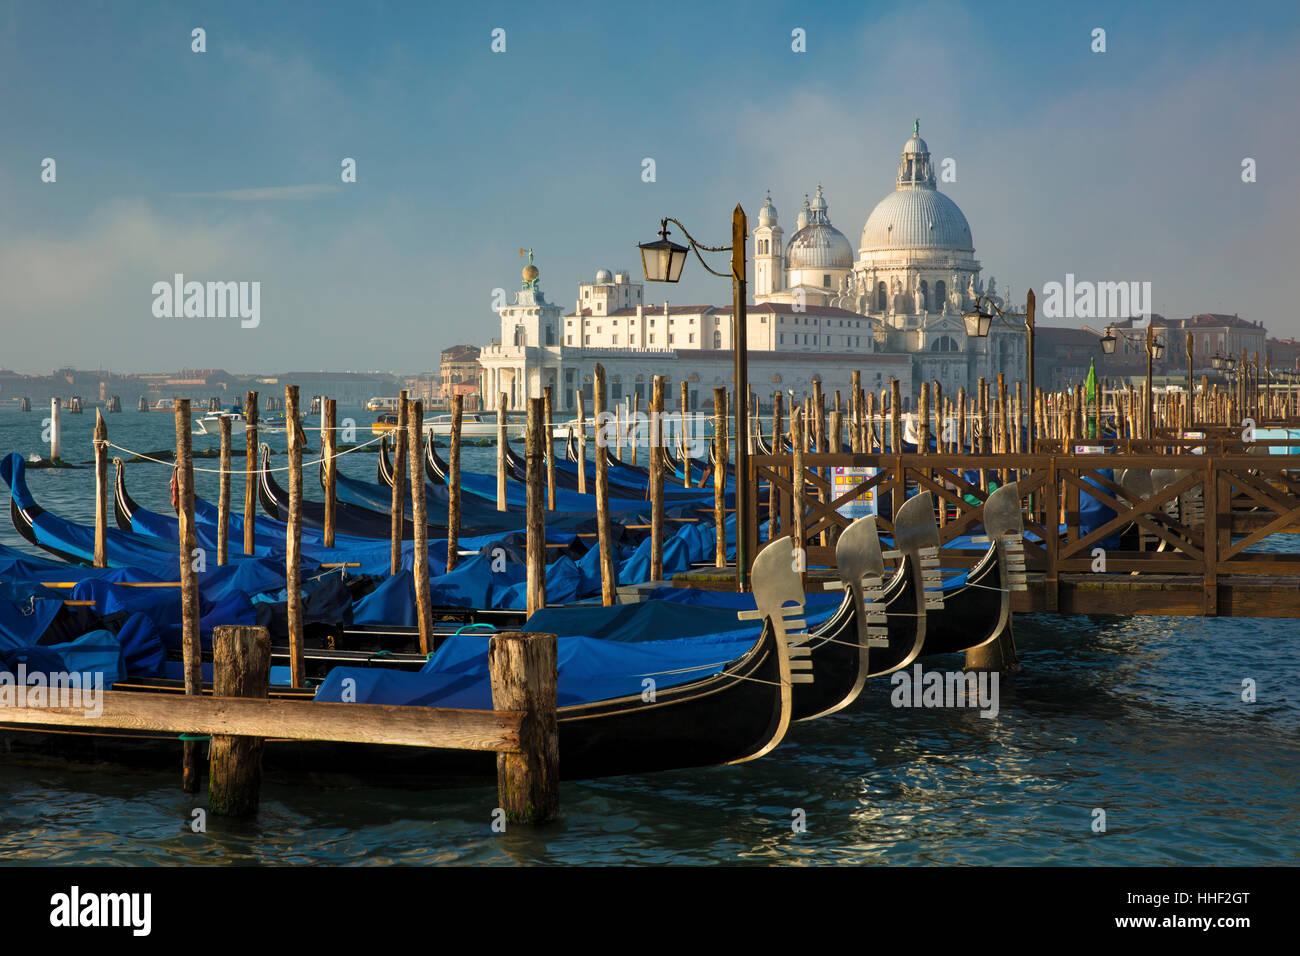 Schaukelnden Gondeln unter Santa Maria della Salute, Venedig, Veneto, Italien Stockbild